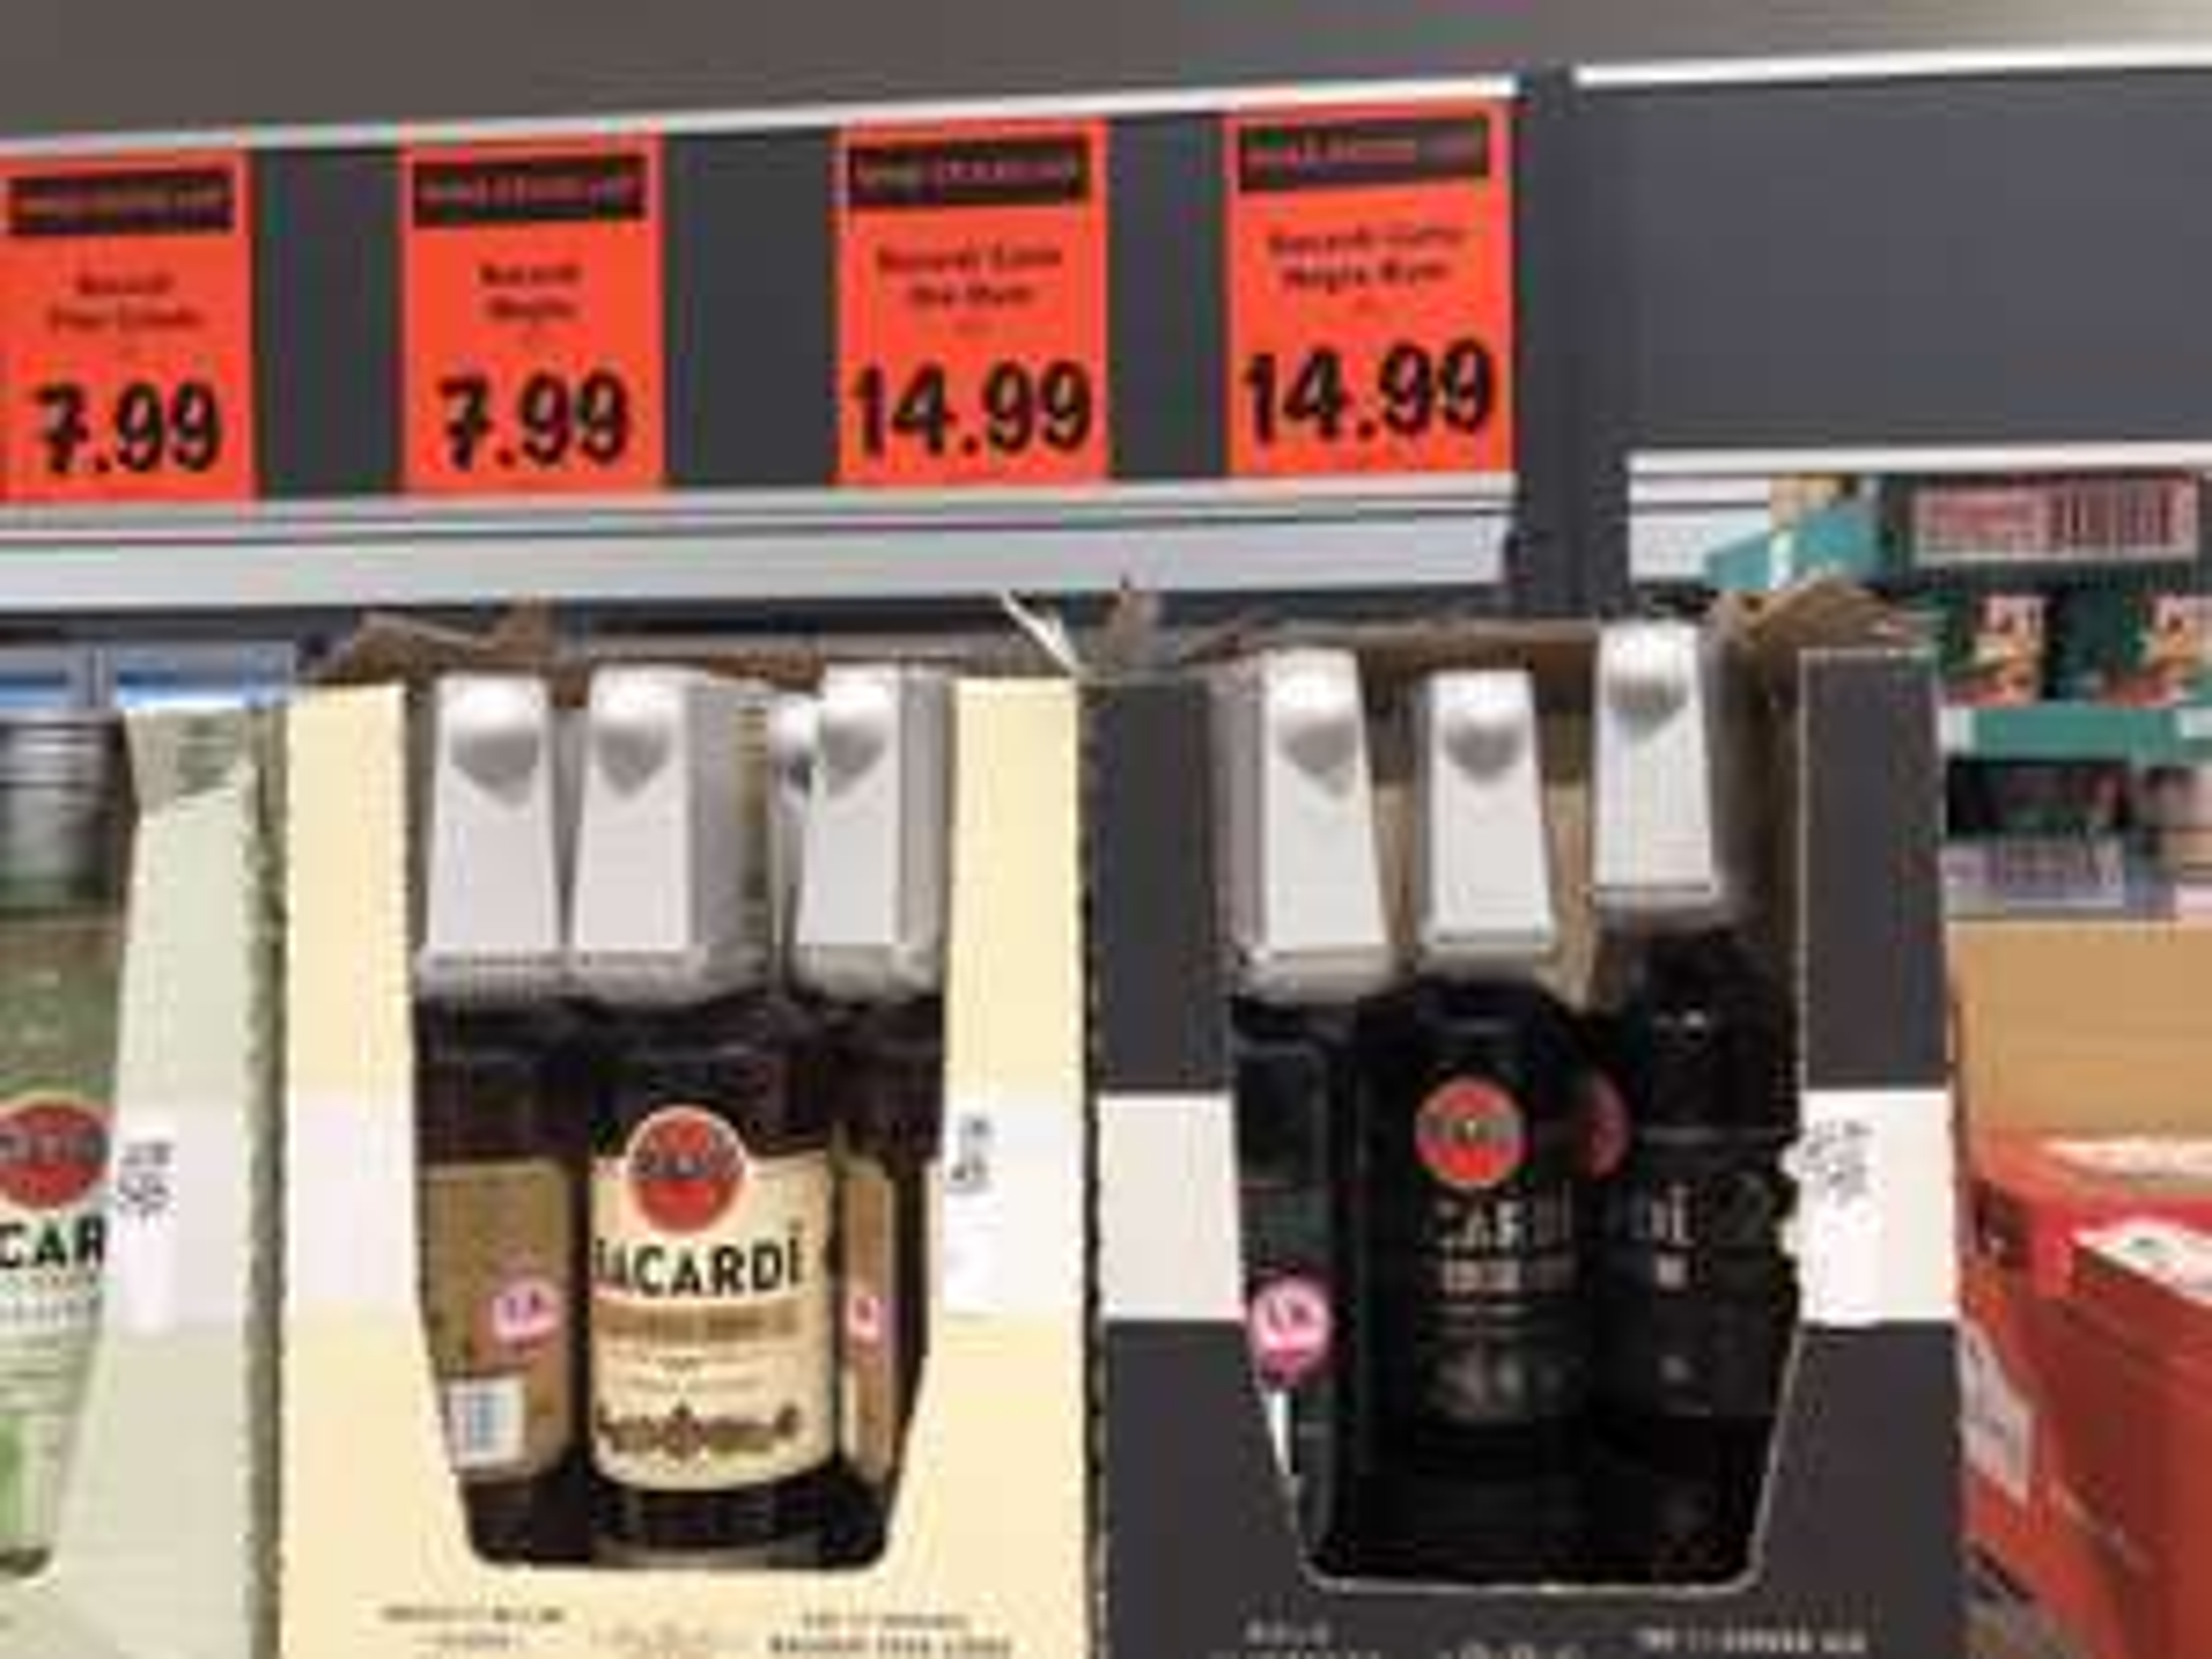 Bacardi Carta Oro / Negra 70cl Rum - £14.99 - Instore LIDL